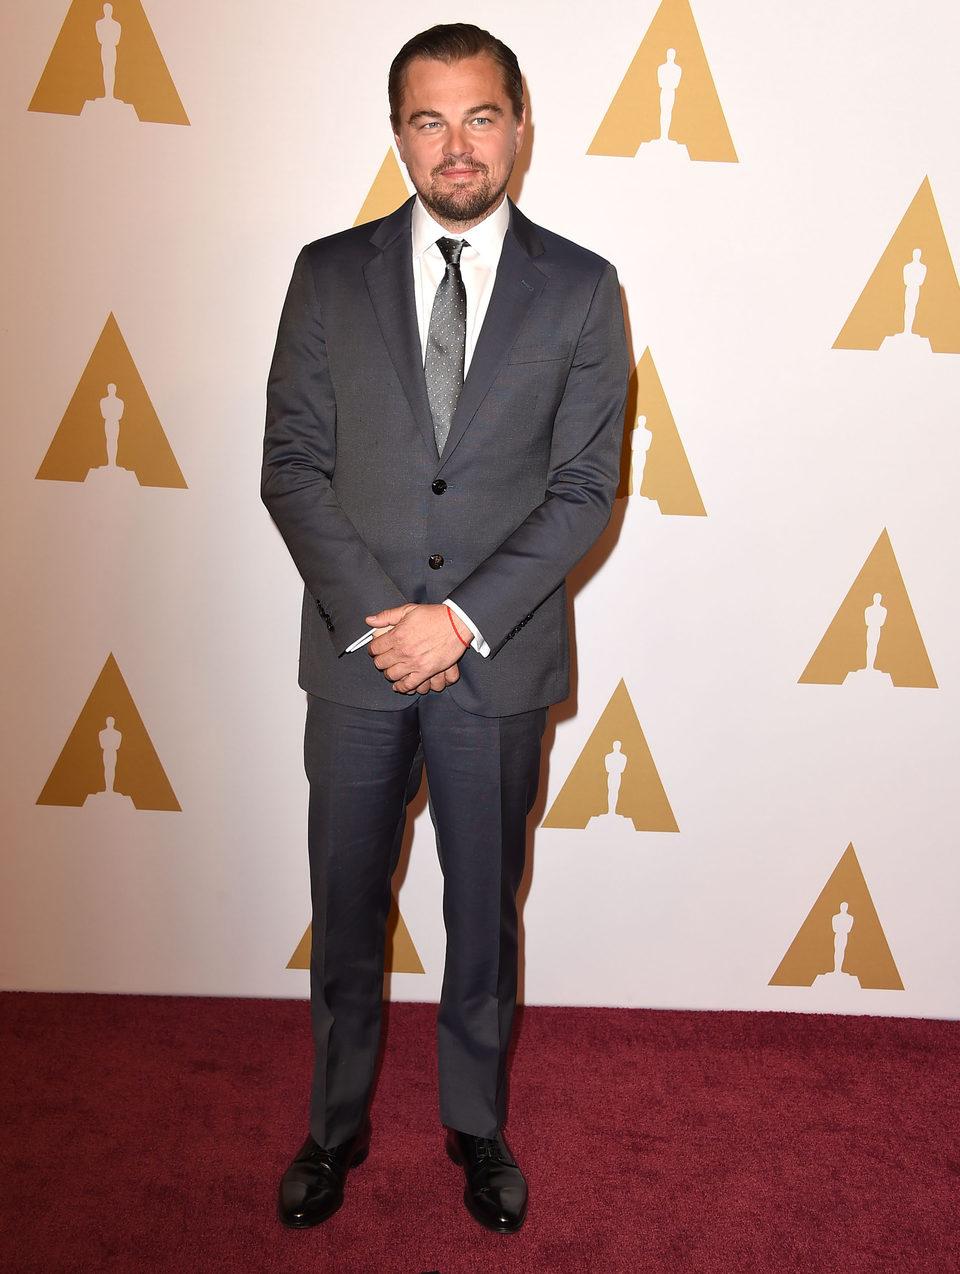 Leonardo DiCaprio at the Oscar 2016 nominees luncheon